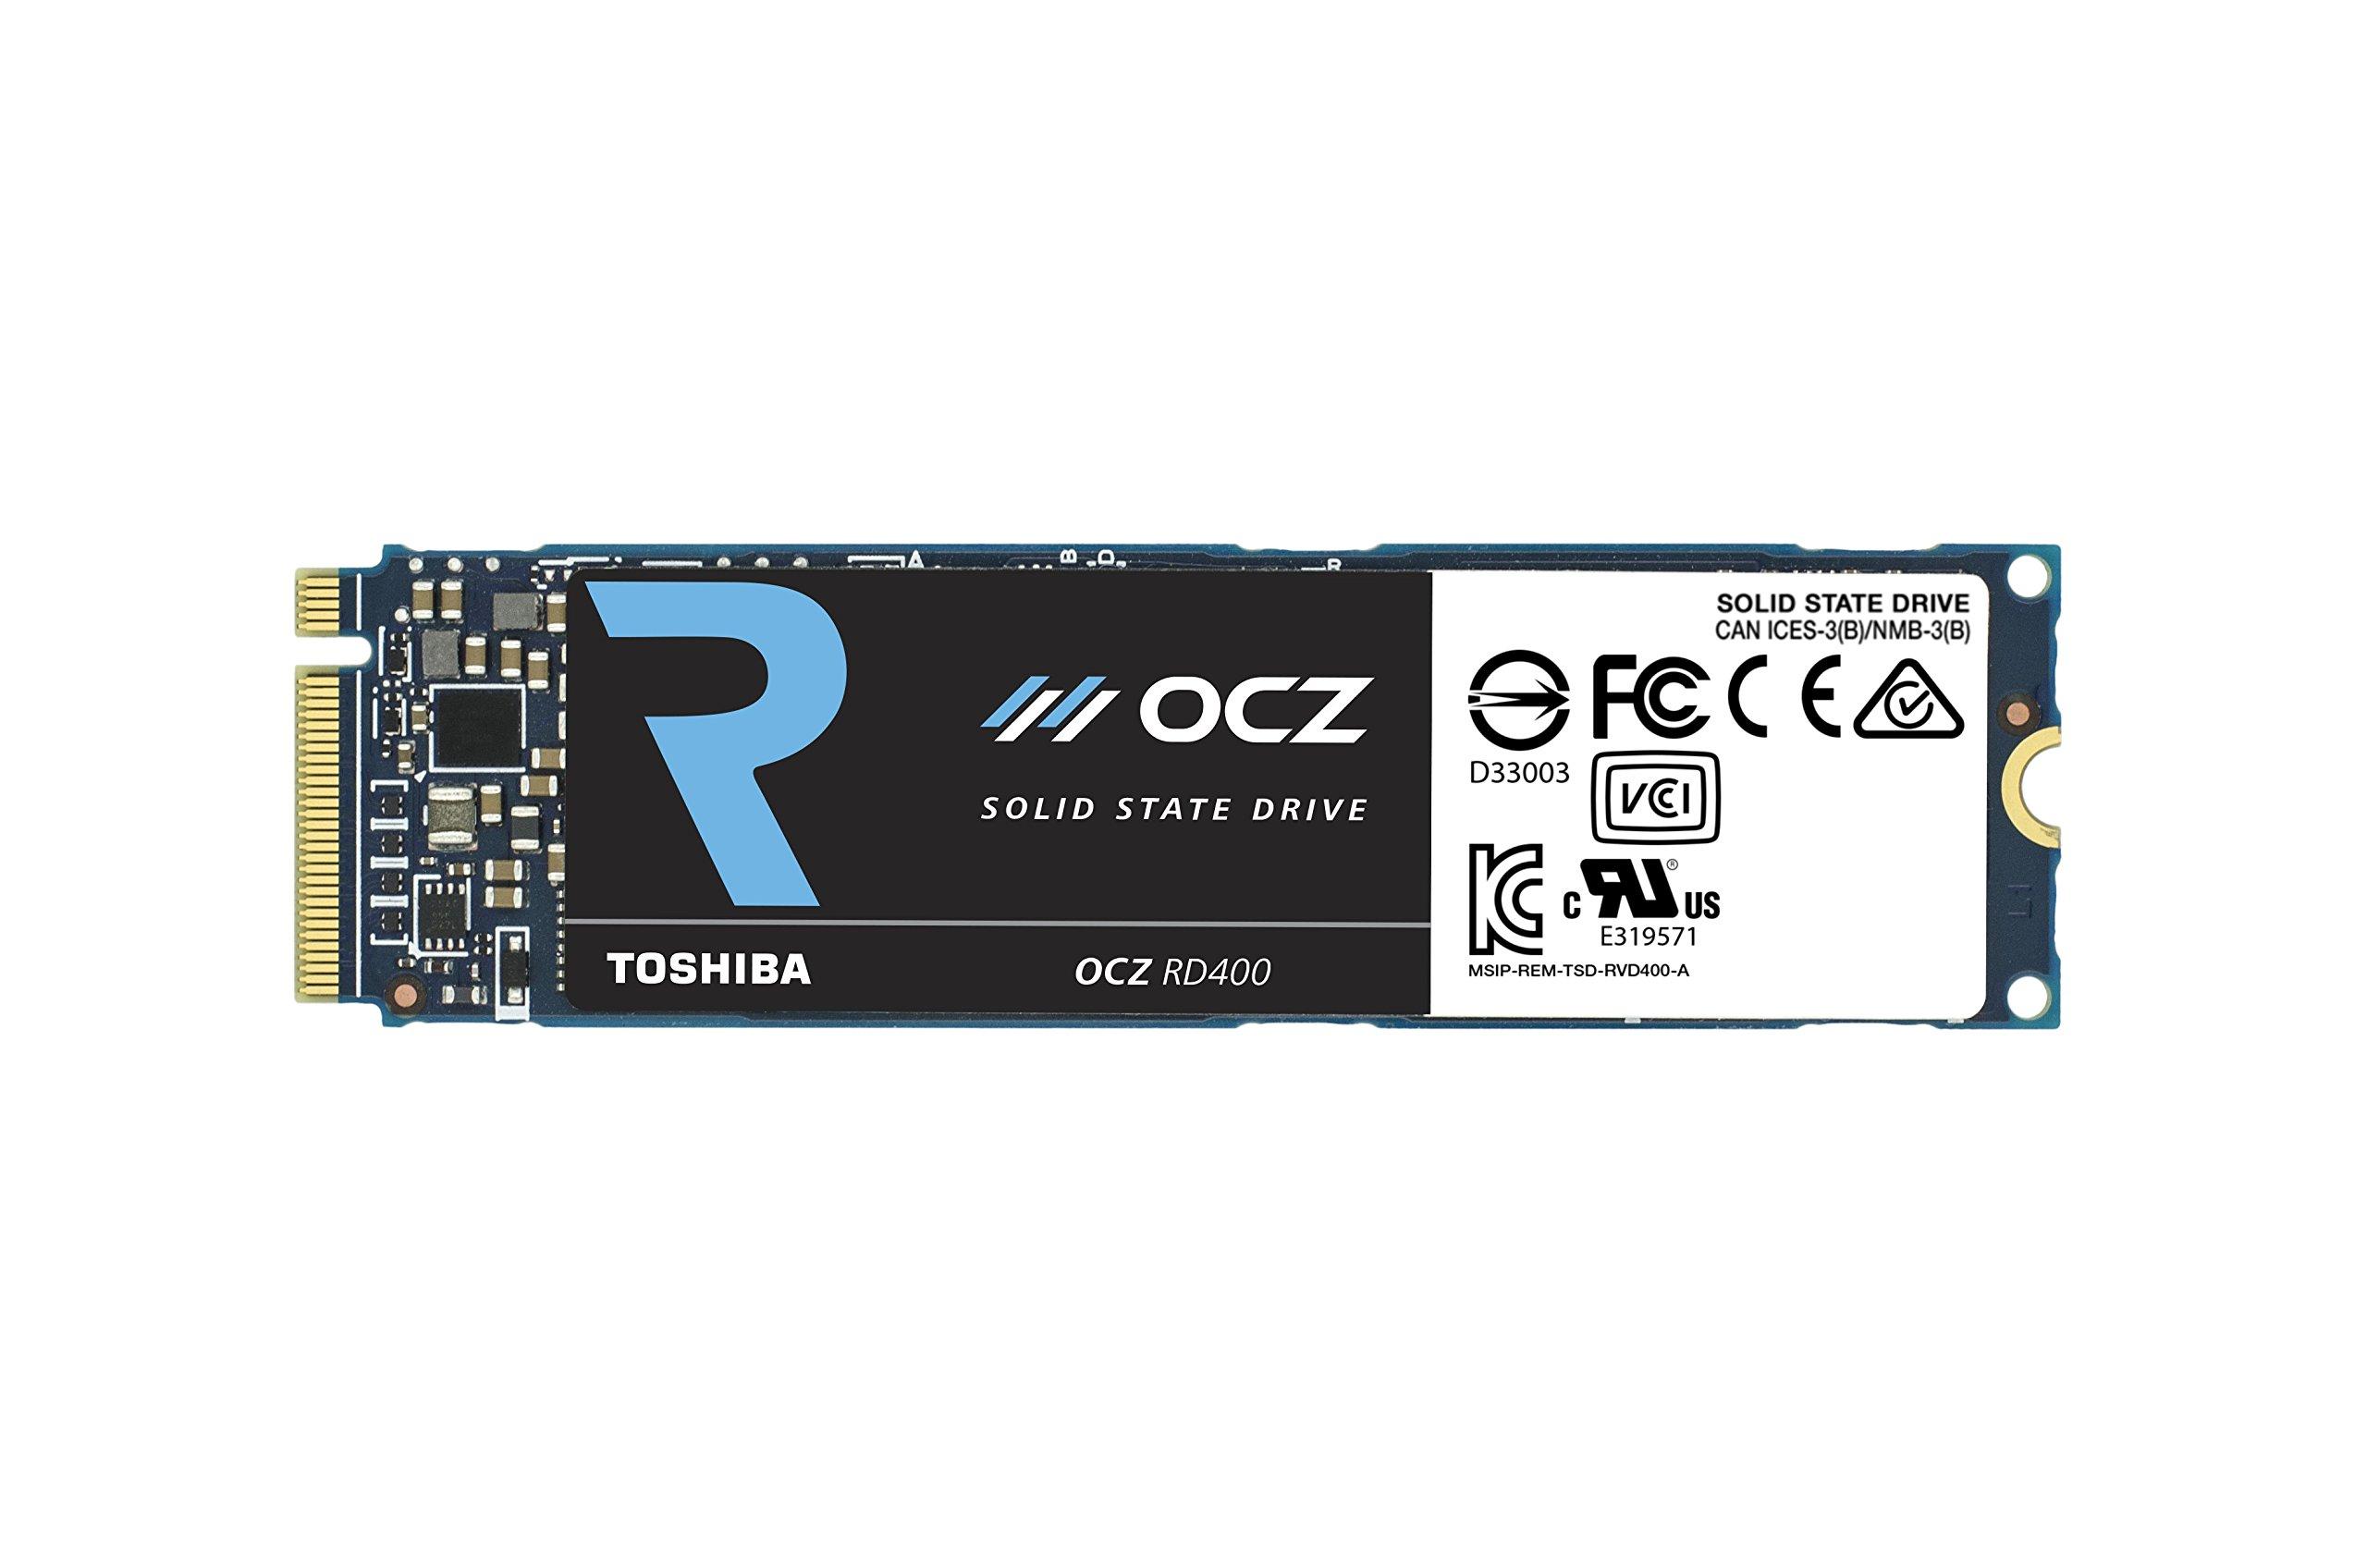 Toshiba OCZ RD400 Series Solid State Drive PCIe NVMe M.2 256GB with MLC Flash (RVD400-M22280-256G) by Toshiba OCZ